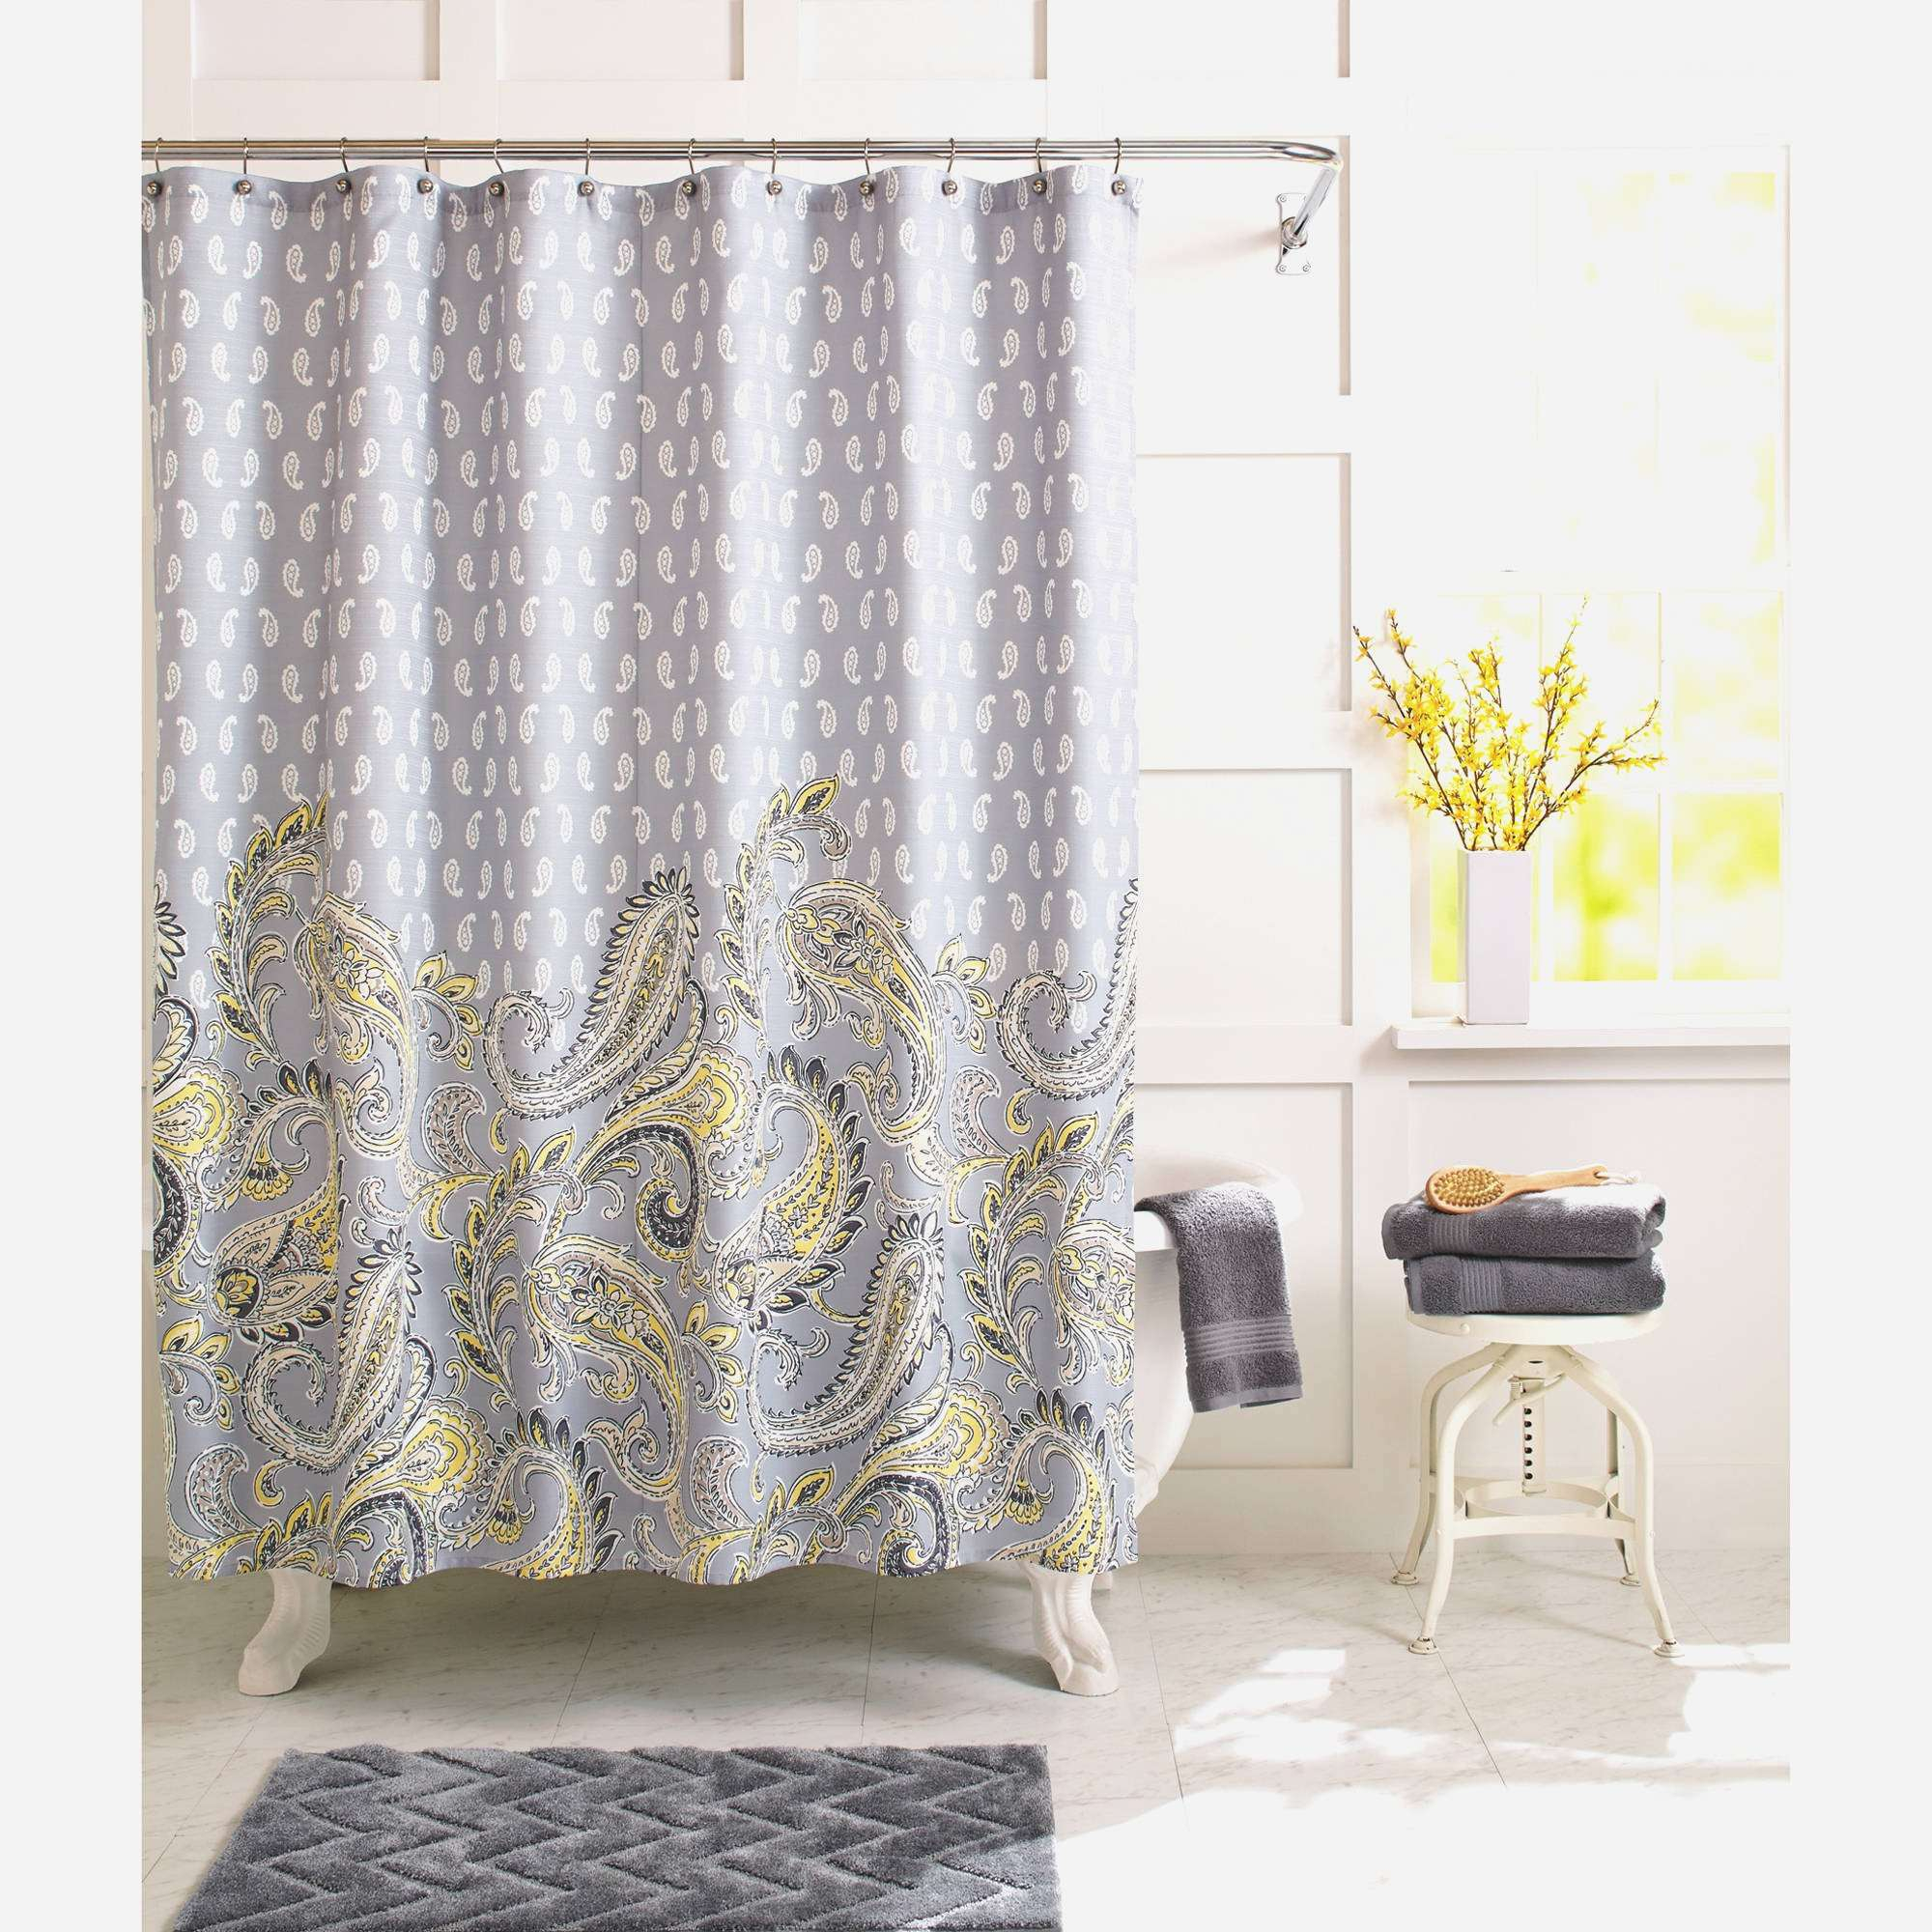 Bathroom Elegant Ideas Burgundy Sets Lime Snowman Bathrooms Pertaining To Kitchen Burgundy/white Curtain Sets (View 18 of 20)